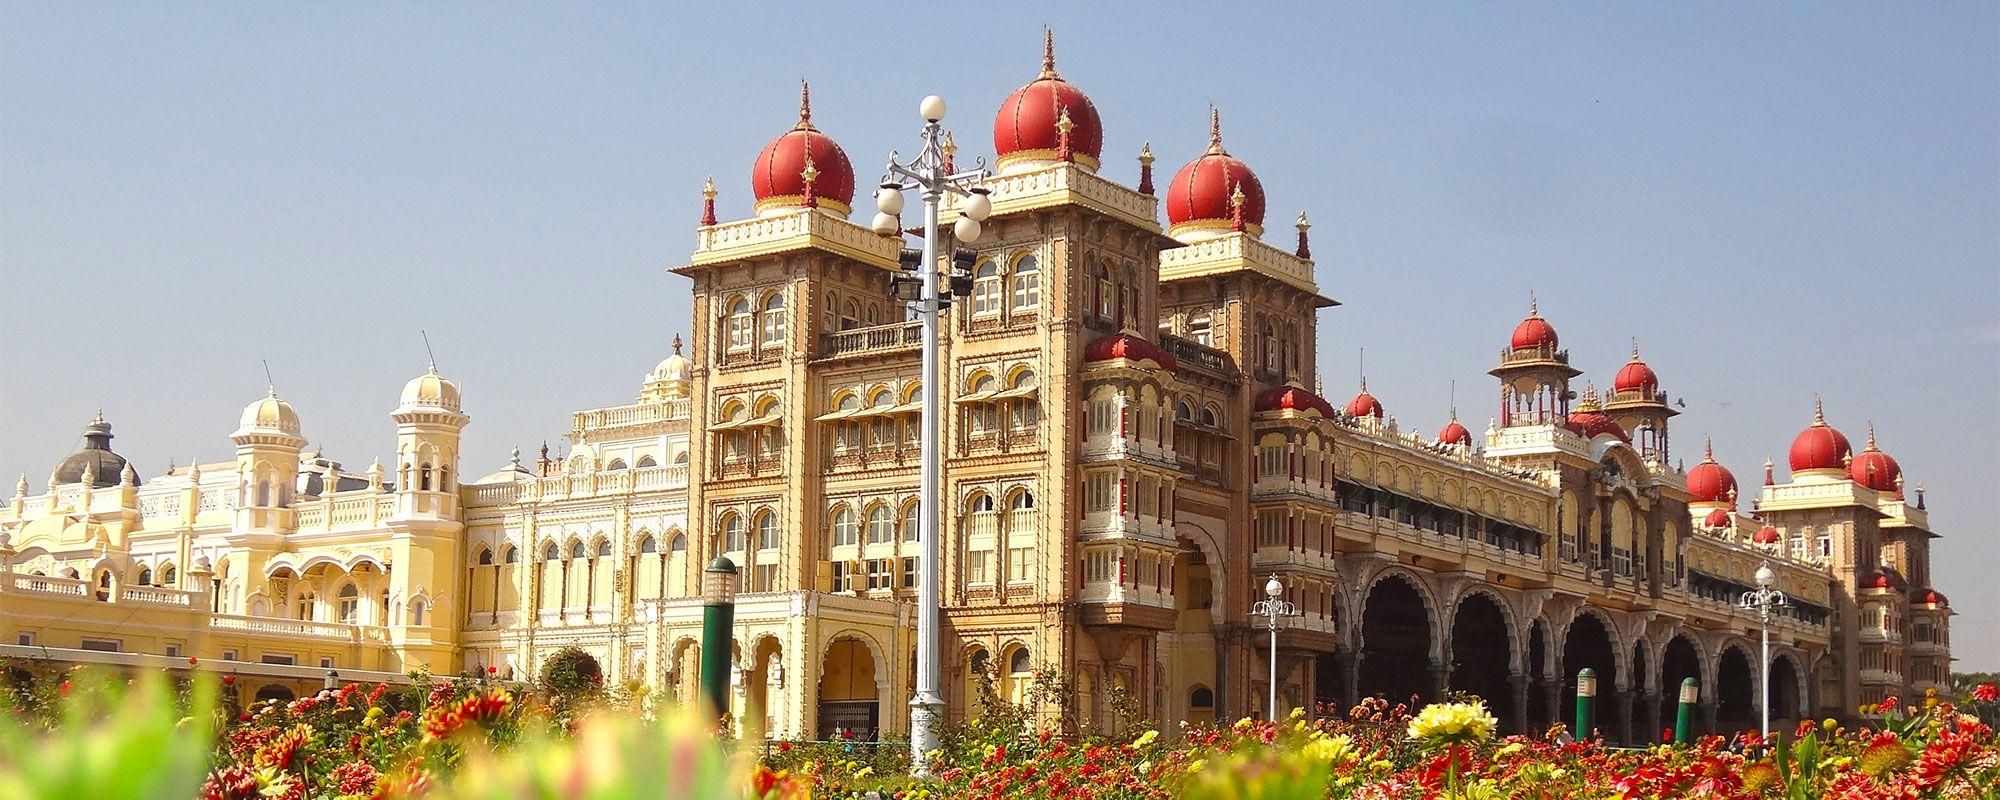 Mysore or mysuru a city in indias karnataka state was the mysore or mysuru a city in indias karnataka state was the capital biocorpaavc Image collections